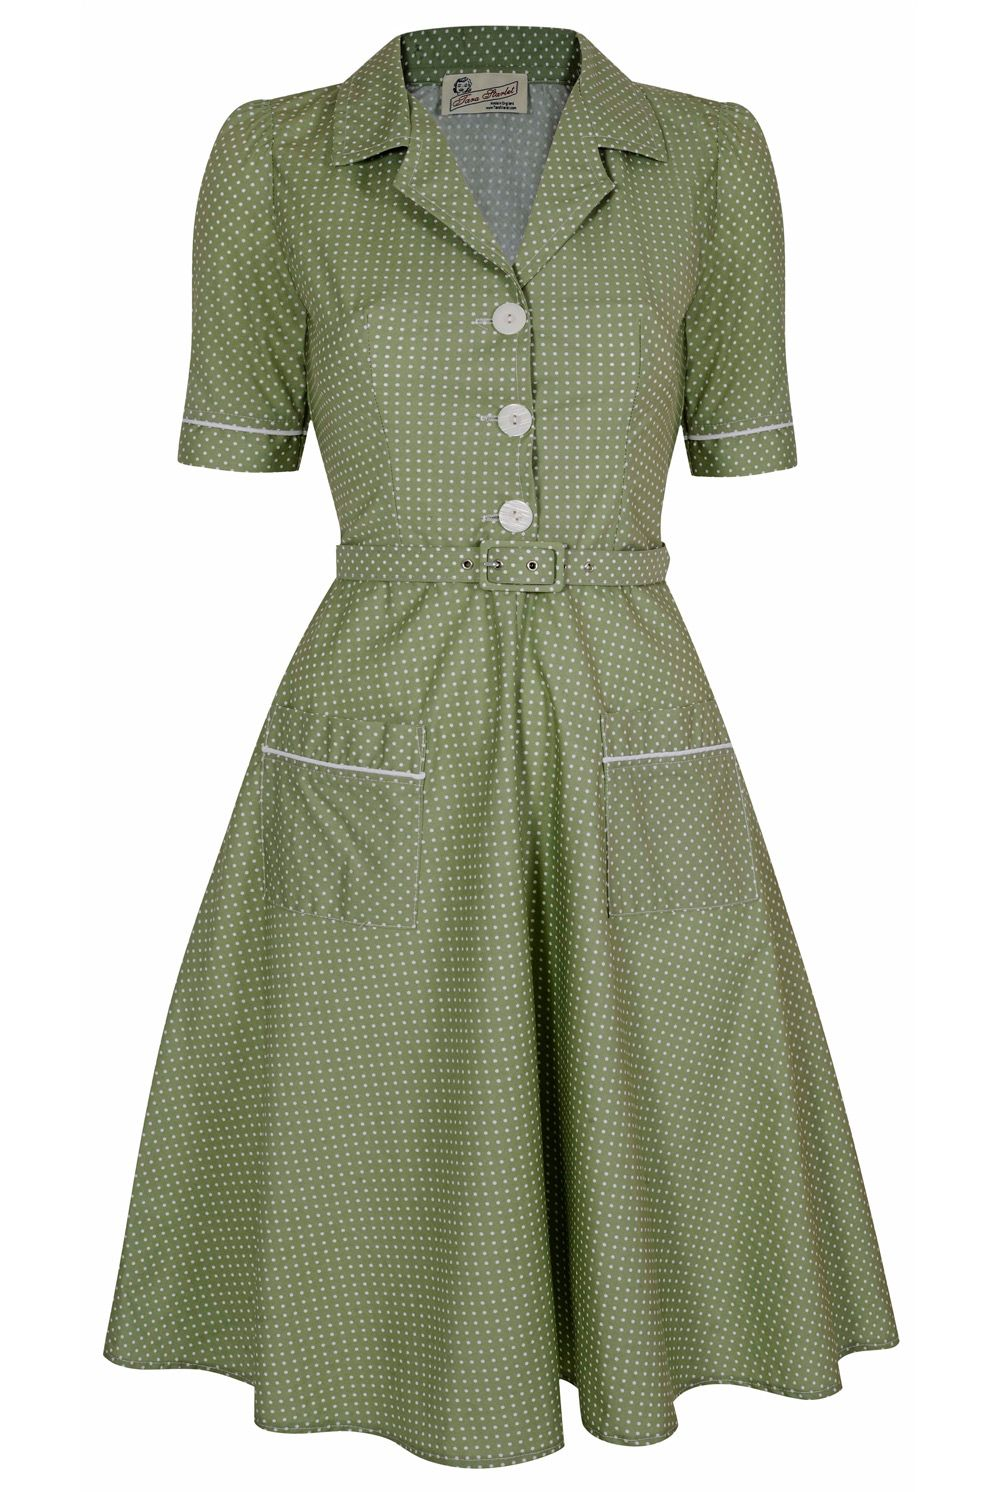 Tara Starlet 1940s 40s Style: Retro Fashion, Clothes